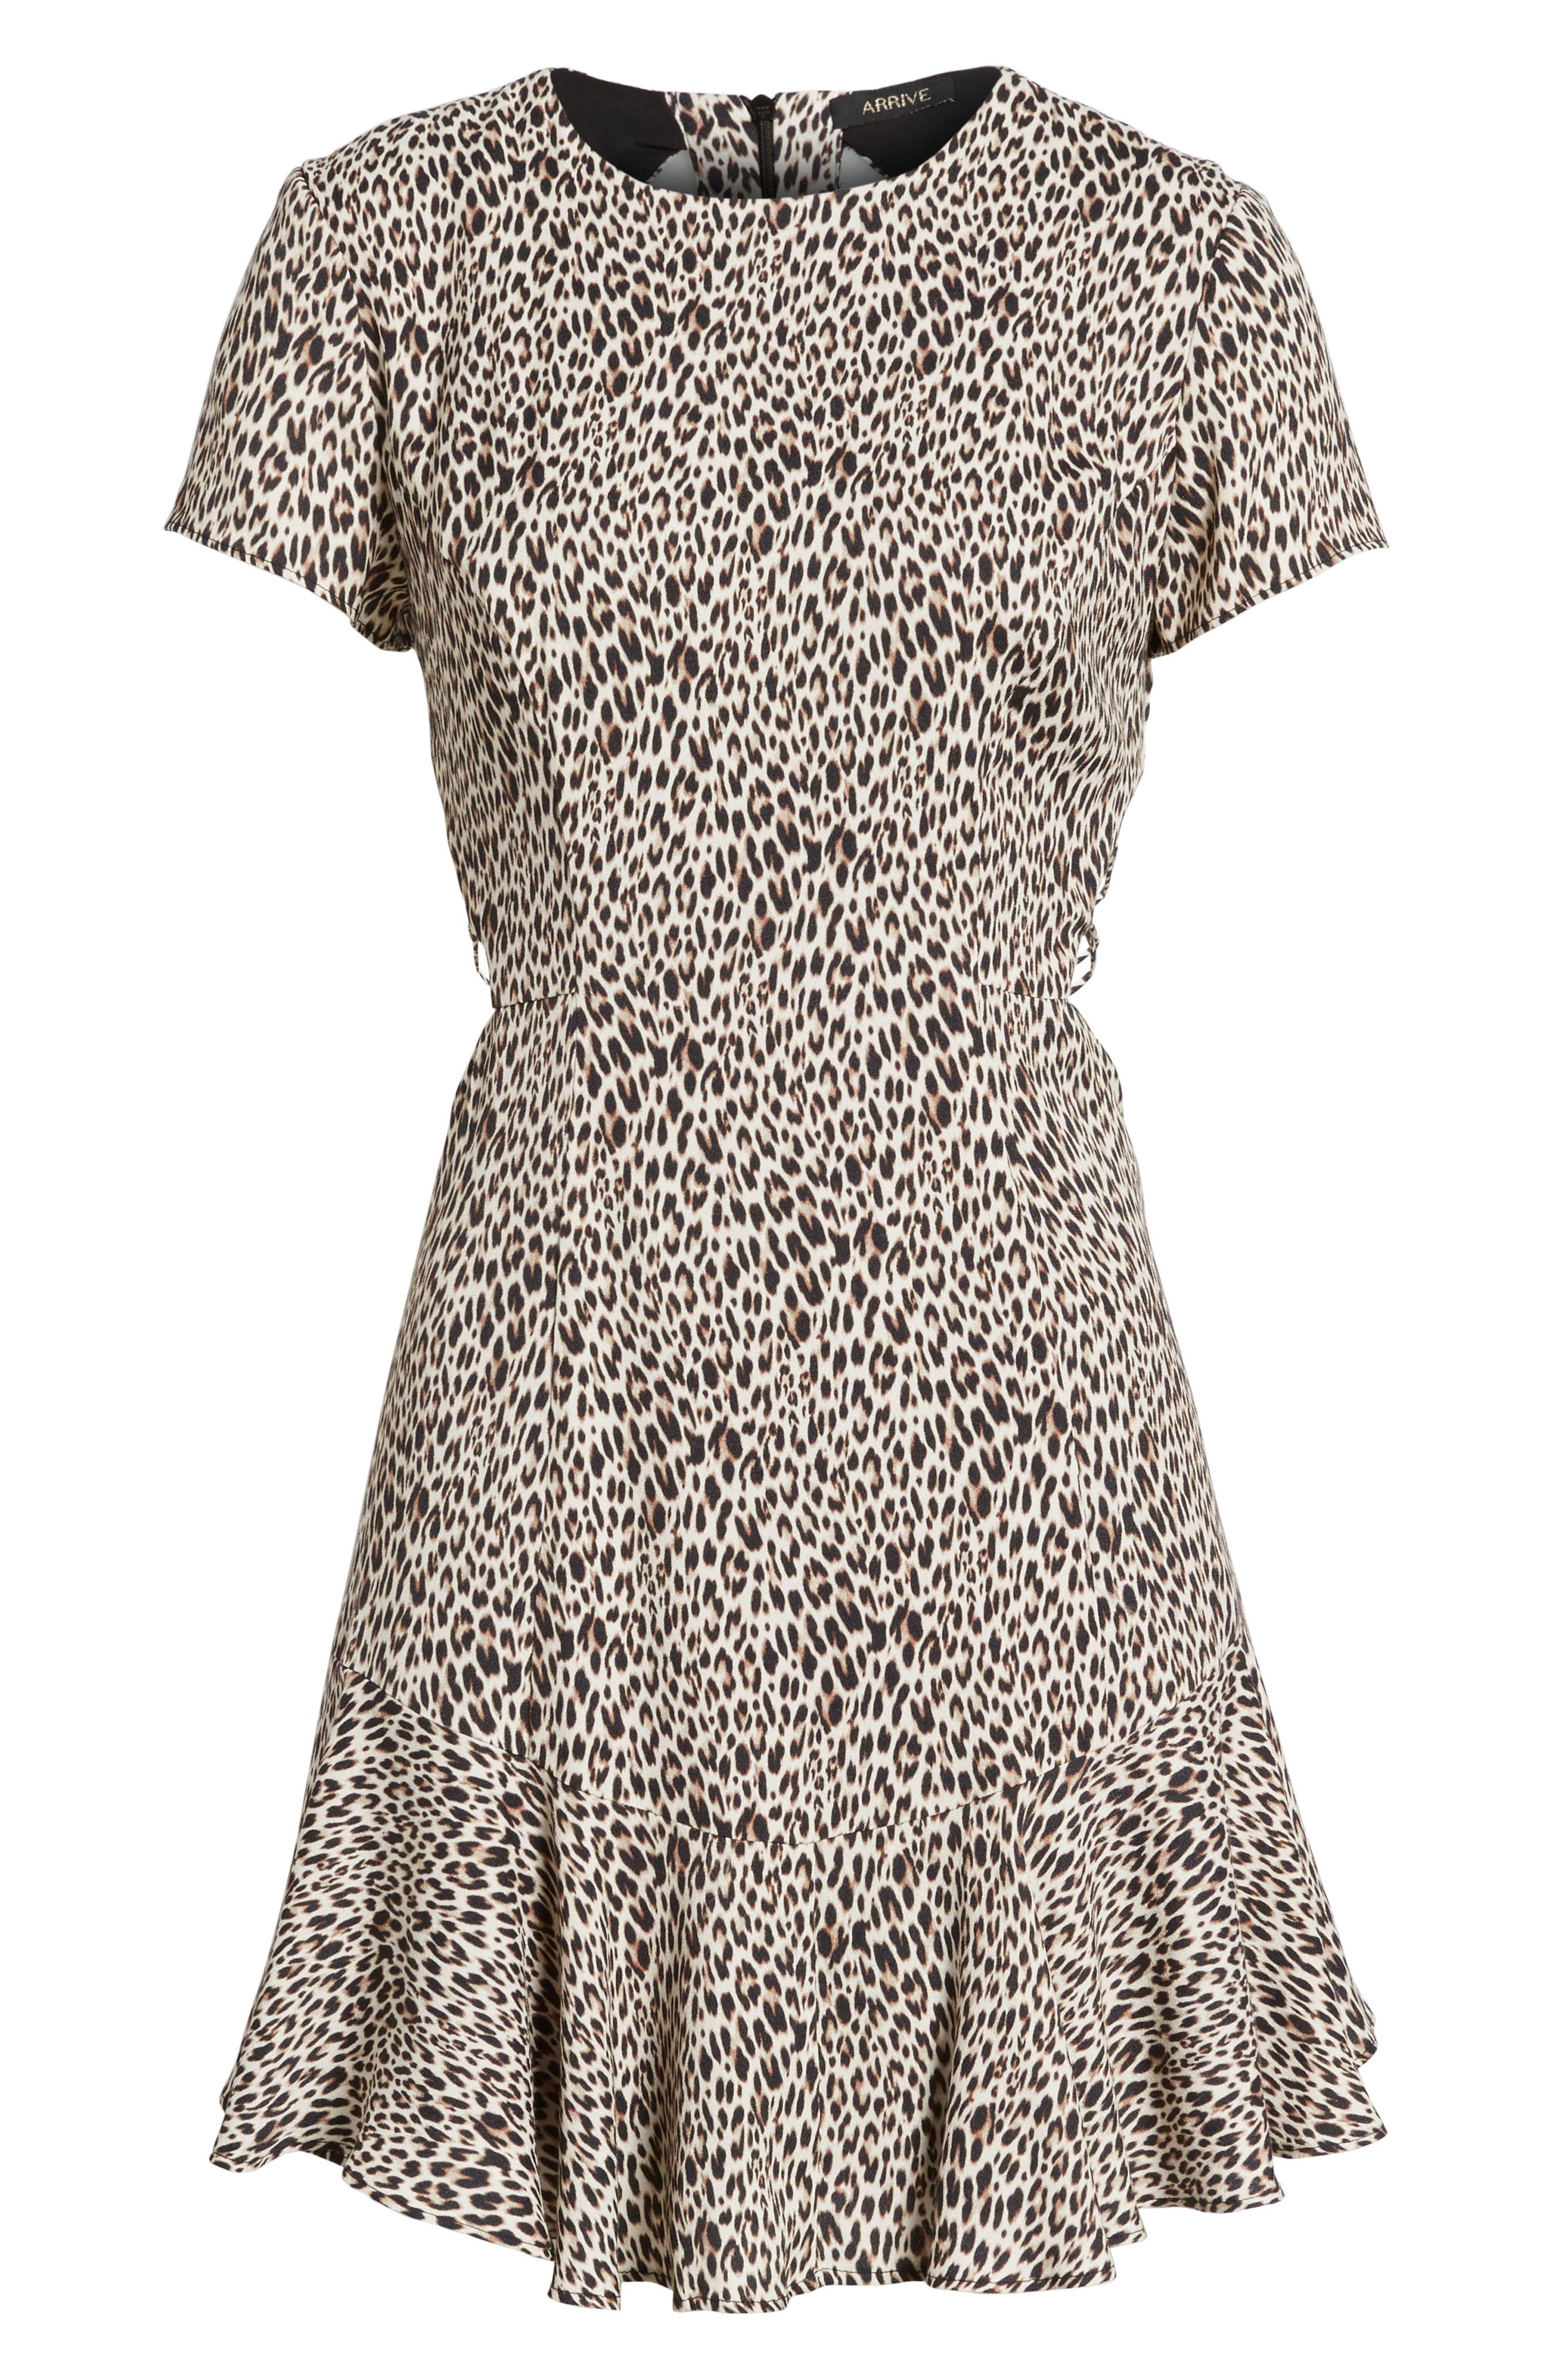 Chelsea Lattice Back Fit & Flare Dress,                             Alternate thumbnail 23, color,